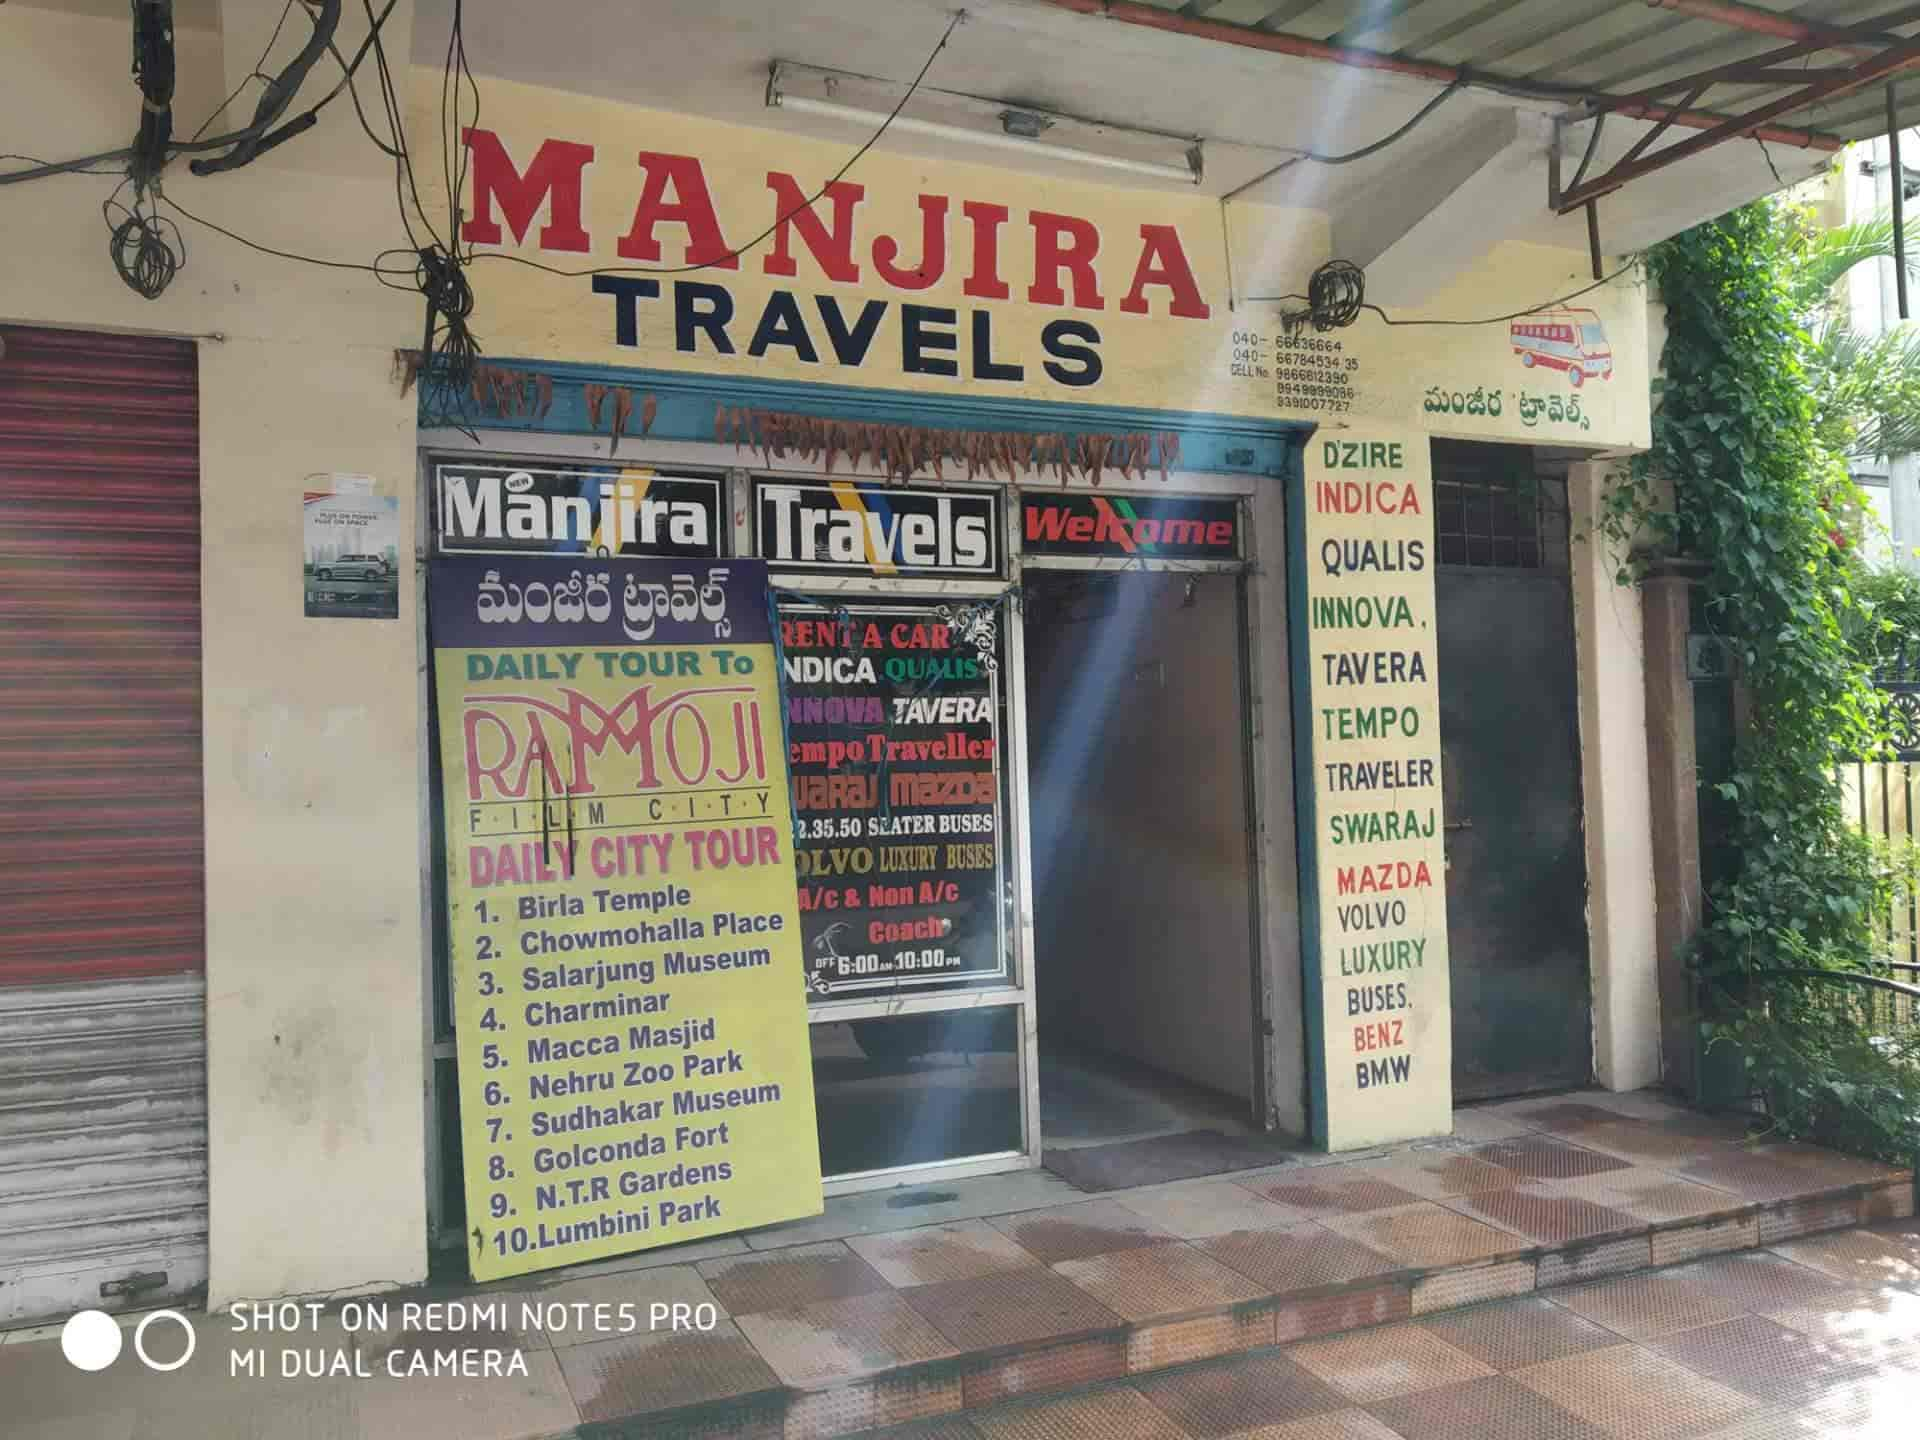 Manjira Travels Photos, Barkatpura, Hyderabad- Pictures & Images